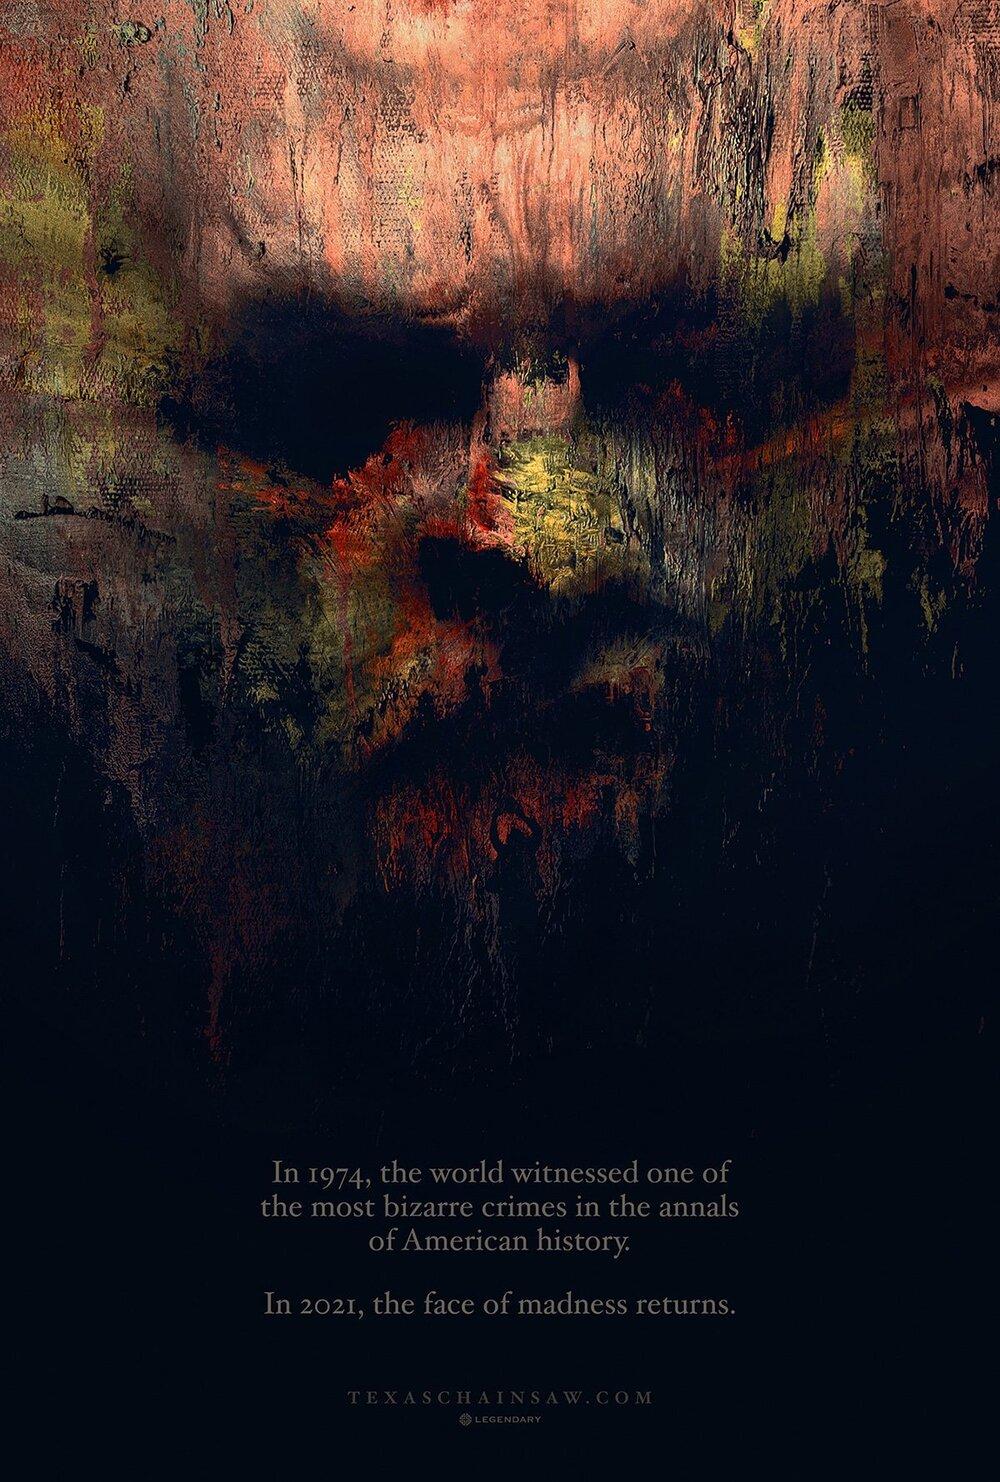 poster-art-for-legendarys-texas-chainsaw-massacre-reboot-the-face-of-madness-returns3